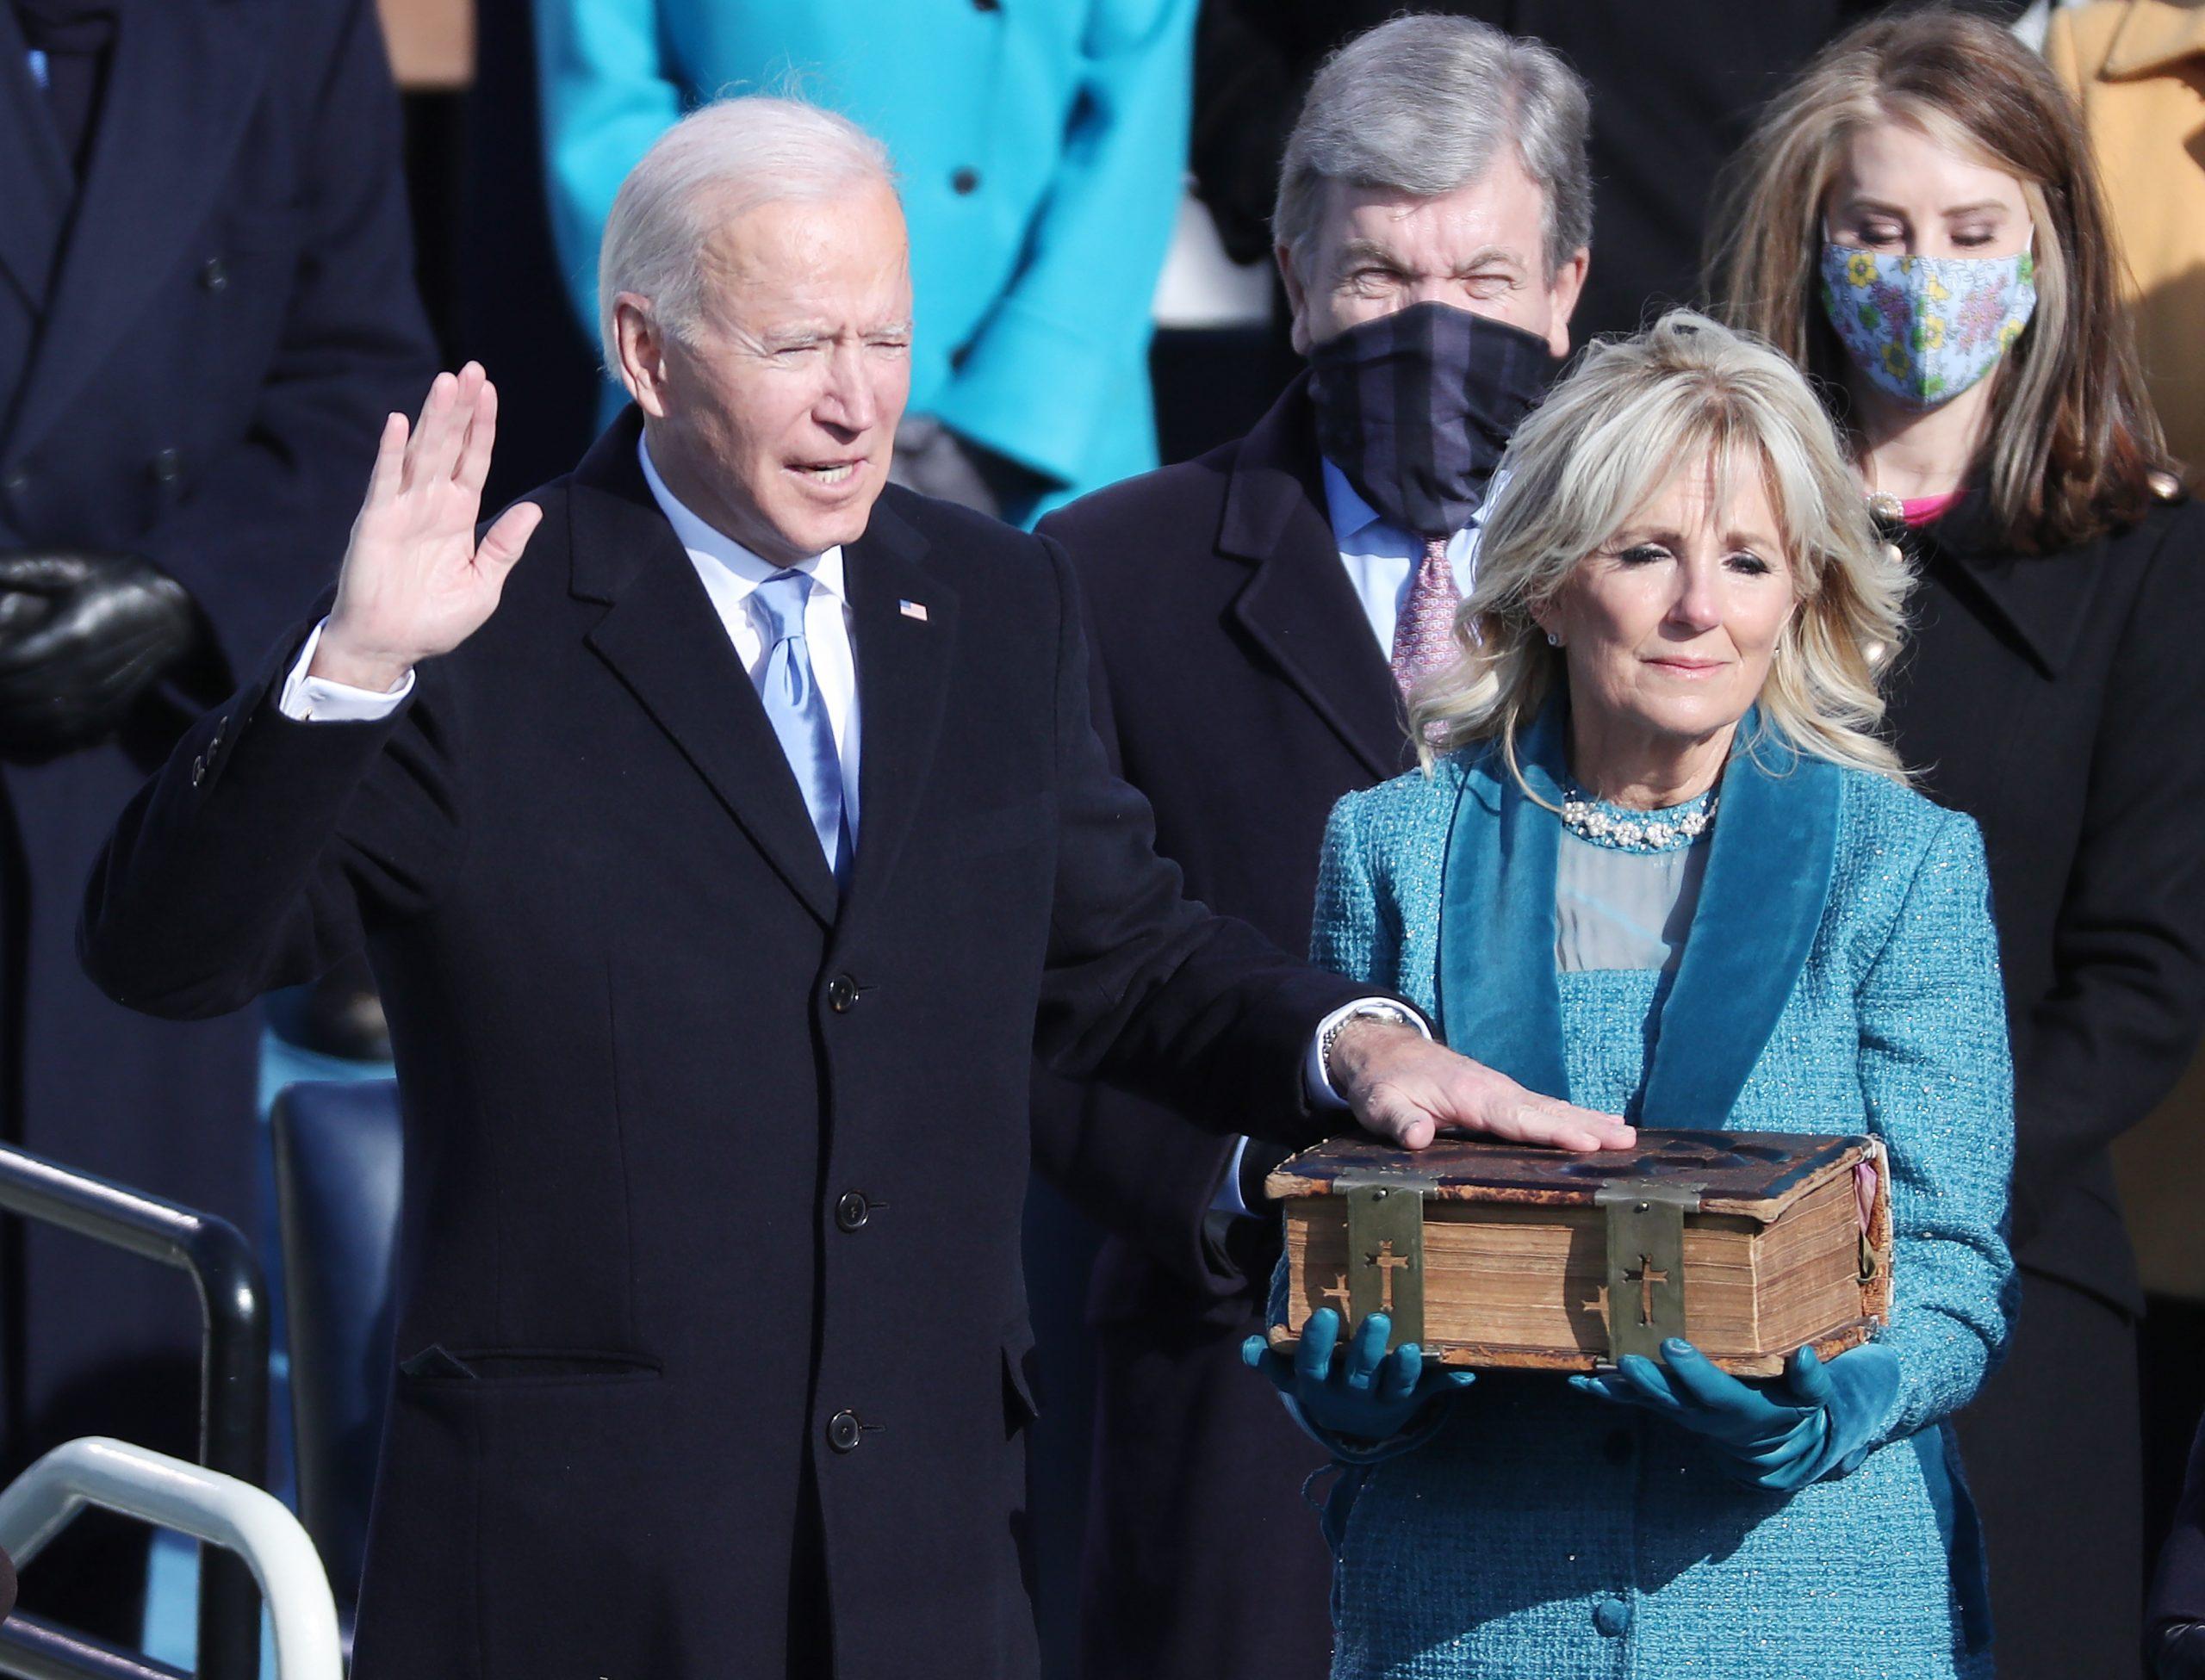 Hungarian Parties Congratulate Joe Biden, Hopeful for Cooperation